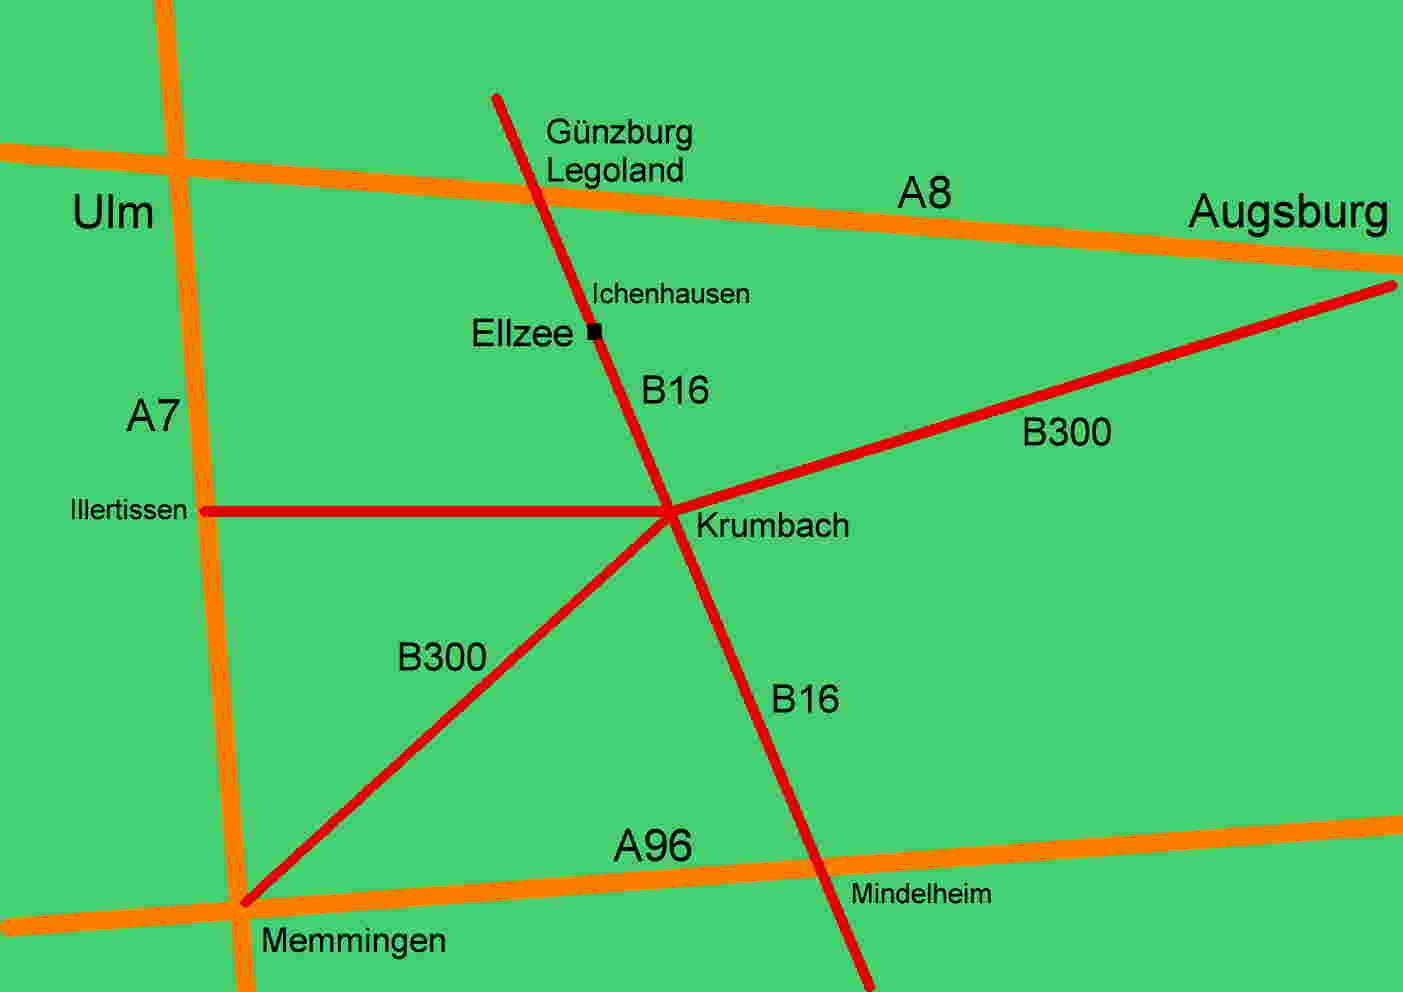 anfahrt ferienwohnung n he legoland deutschland bei g nzburg ferienwohnung ferienhaus g nztal. Black Bedroom Furniture Sets. Home Design Ideas